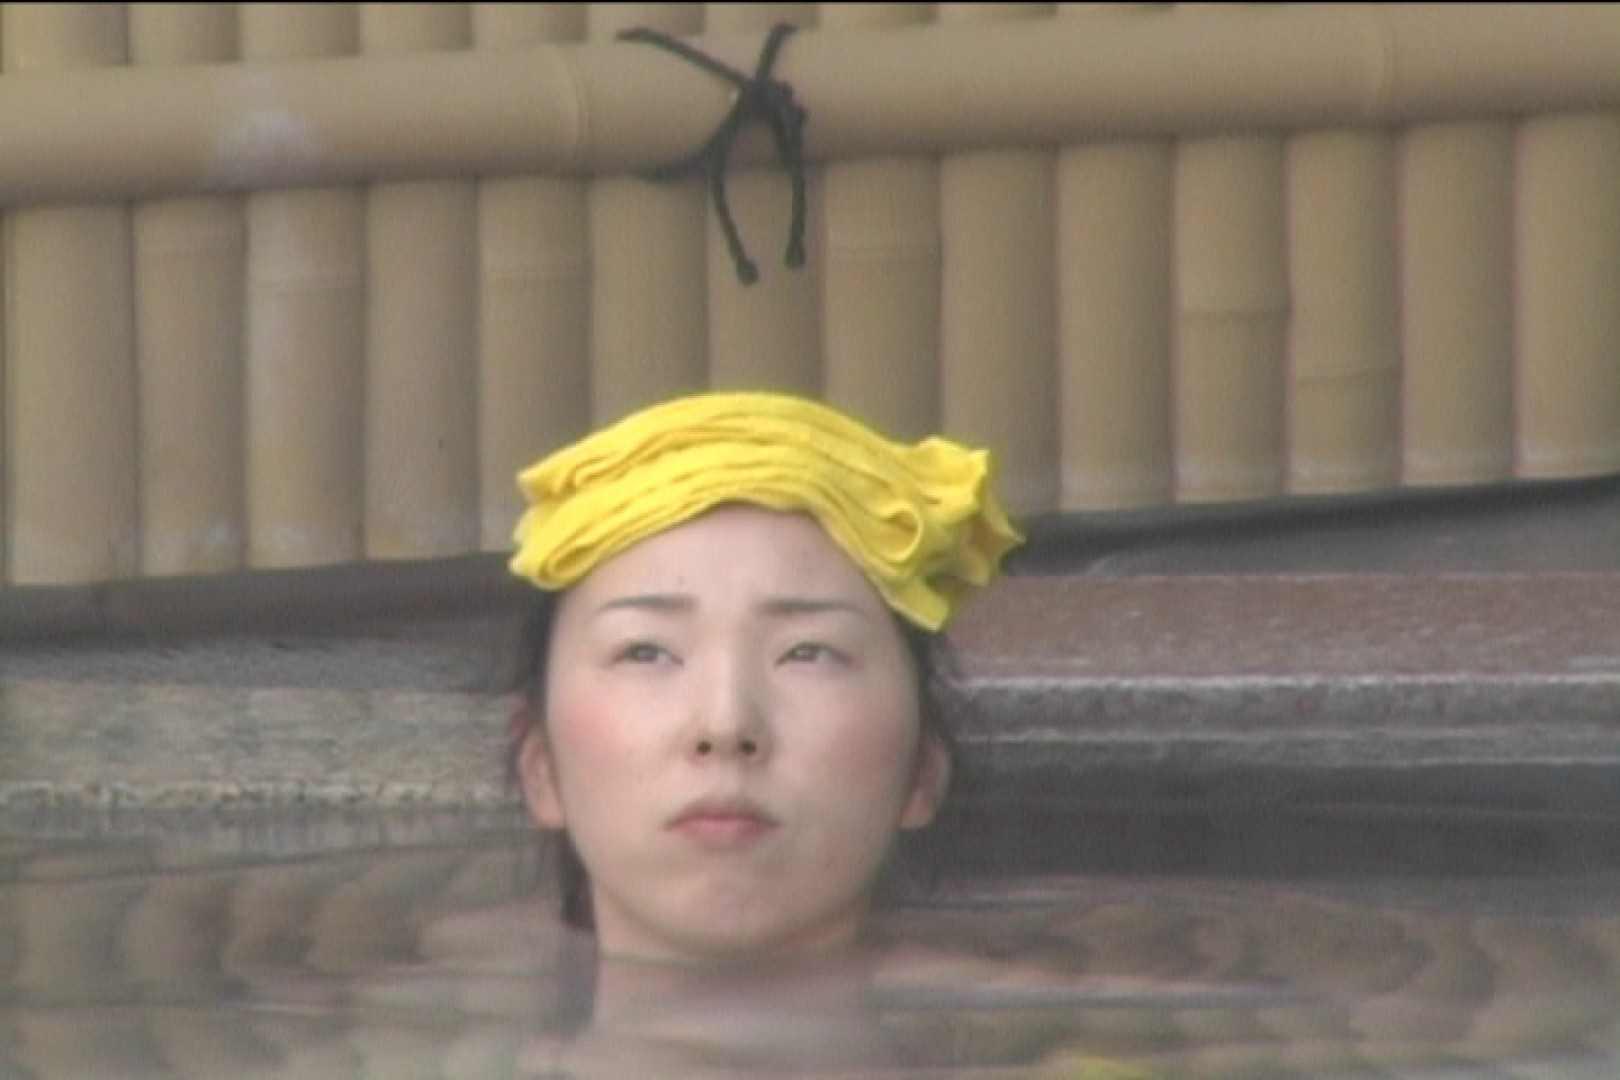 Aquaな露天風呂Vol.529 盗撮映像  51Pix 51